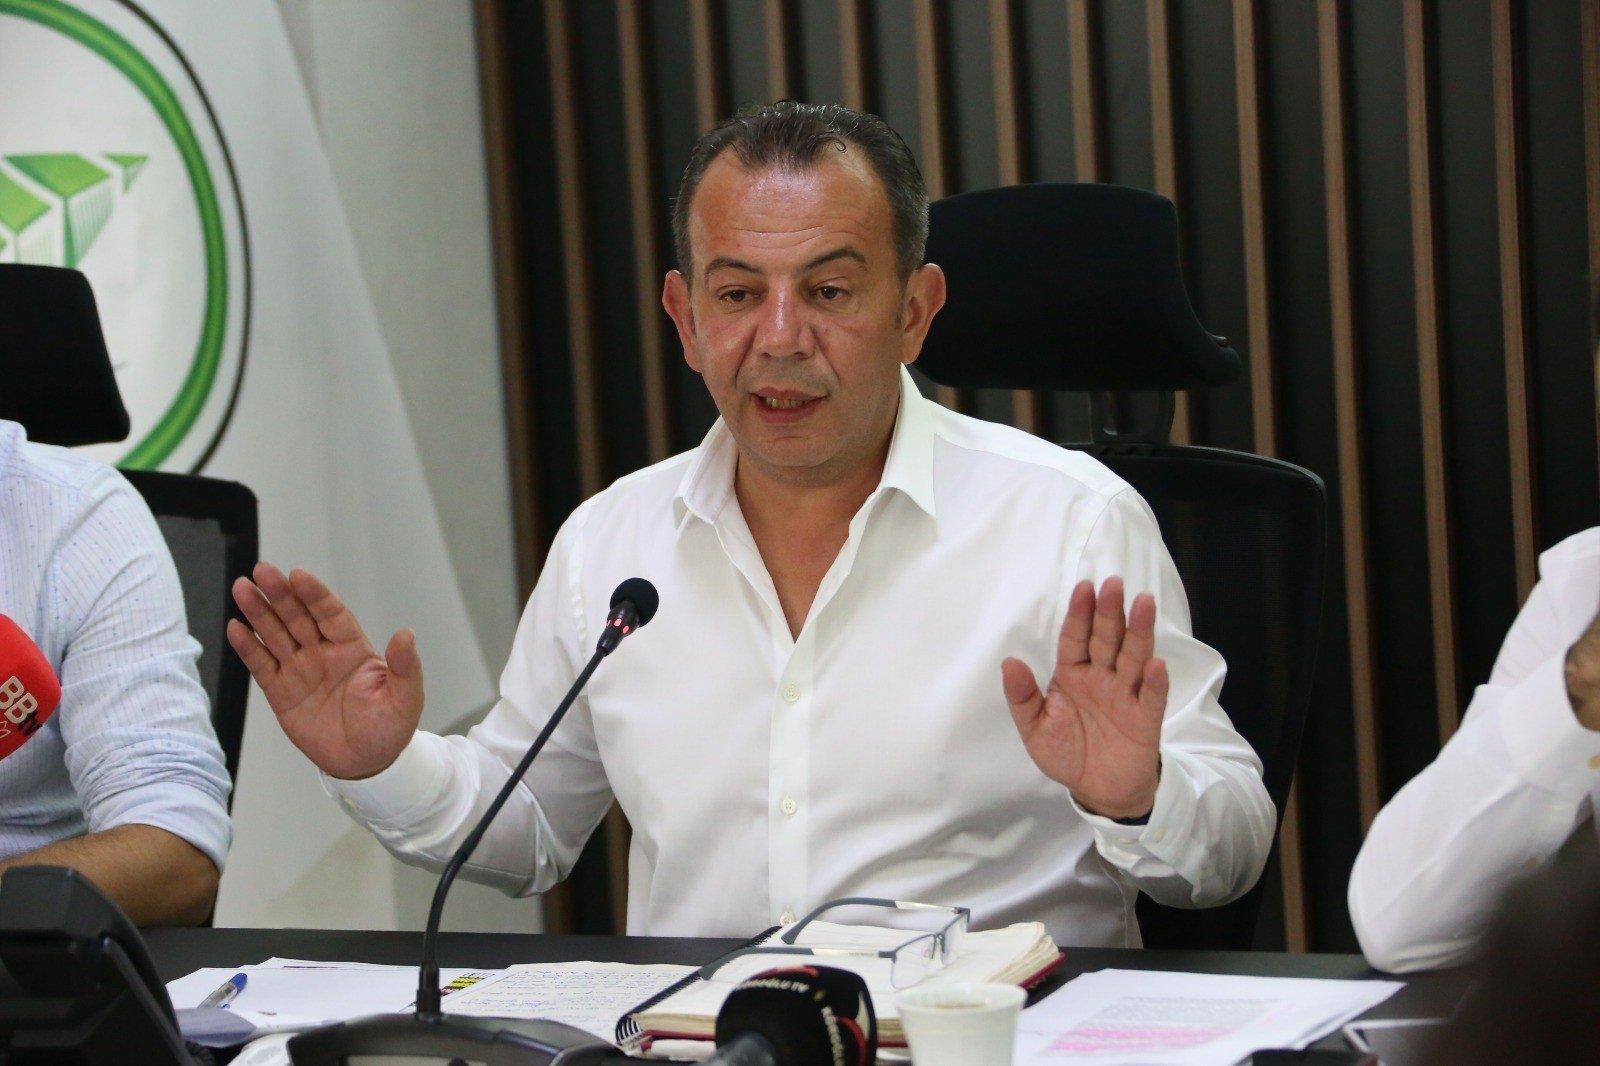 Bolu Mayor Tanju Özcan speaks at a press conference, Bolu, northern Turkey, July 26, 2021. (IHA Photo)